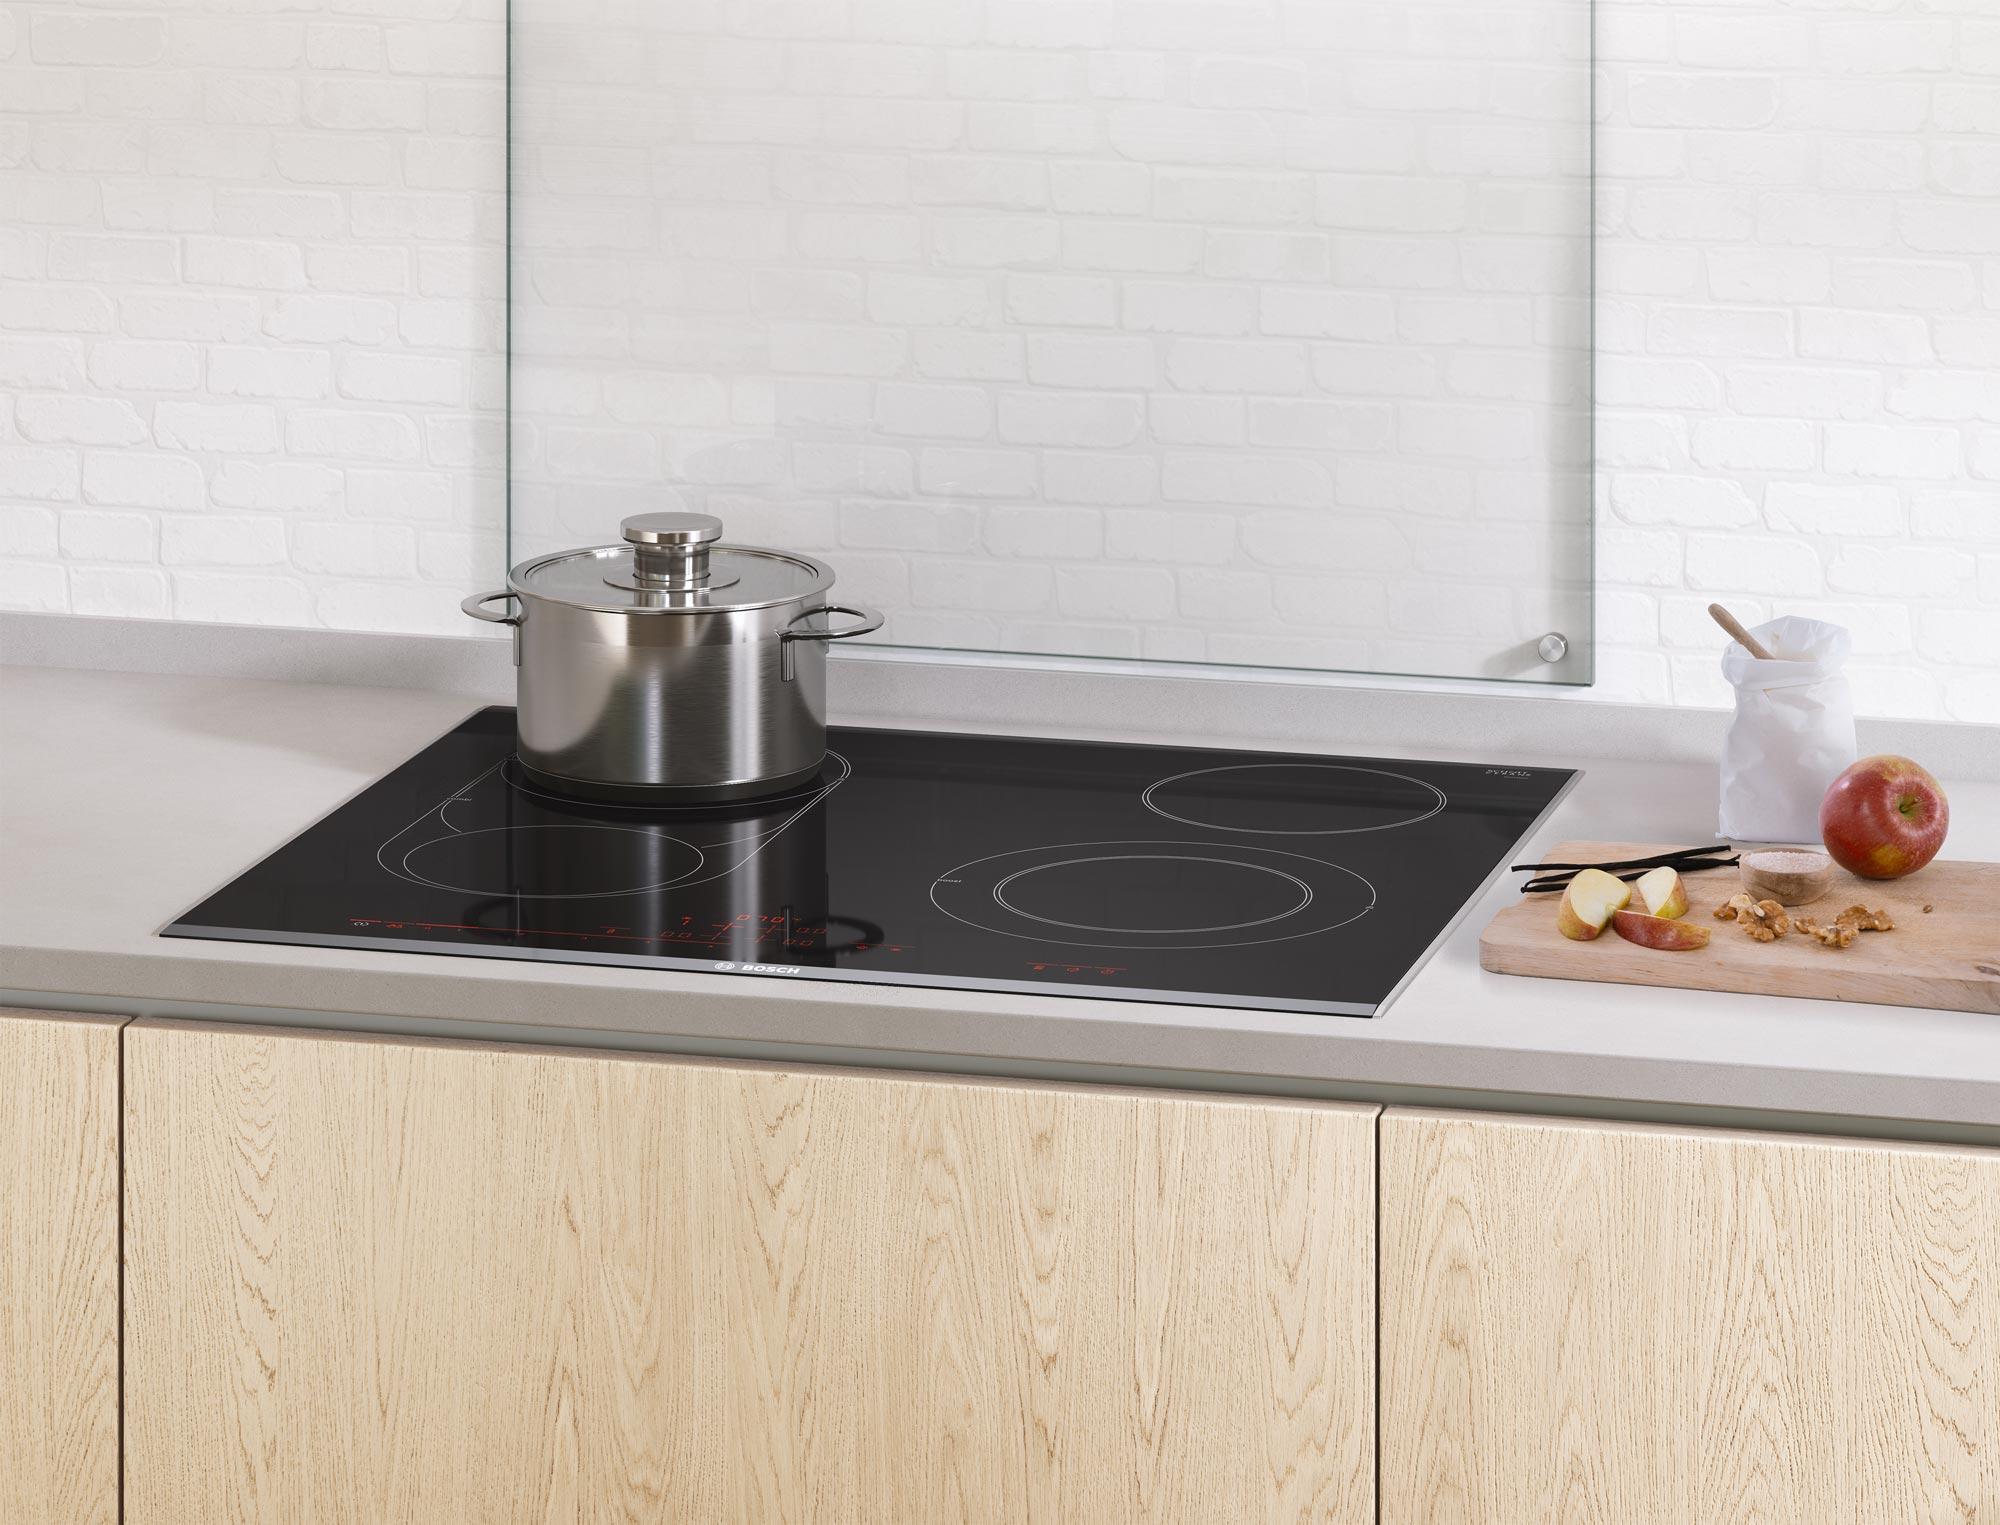 CGI - Bosch - Home Appliances - Induction